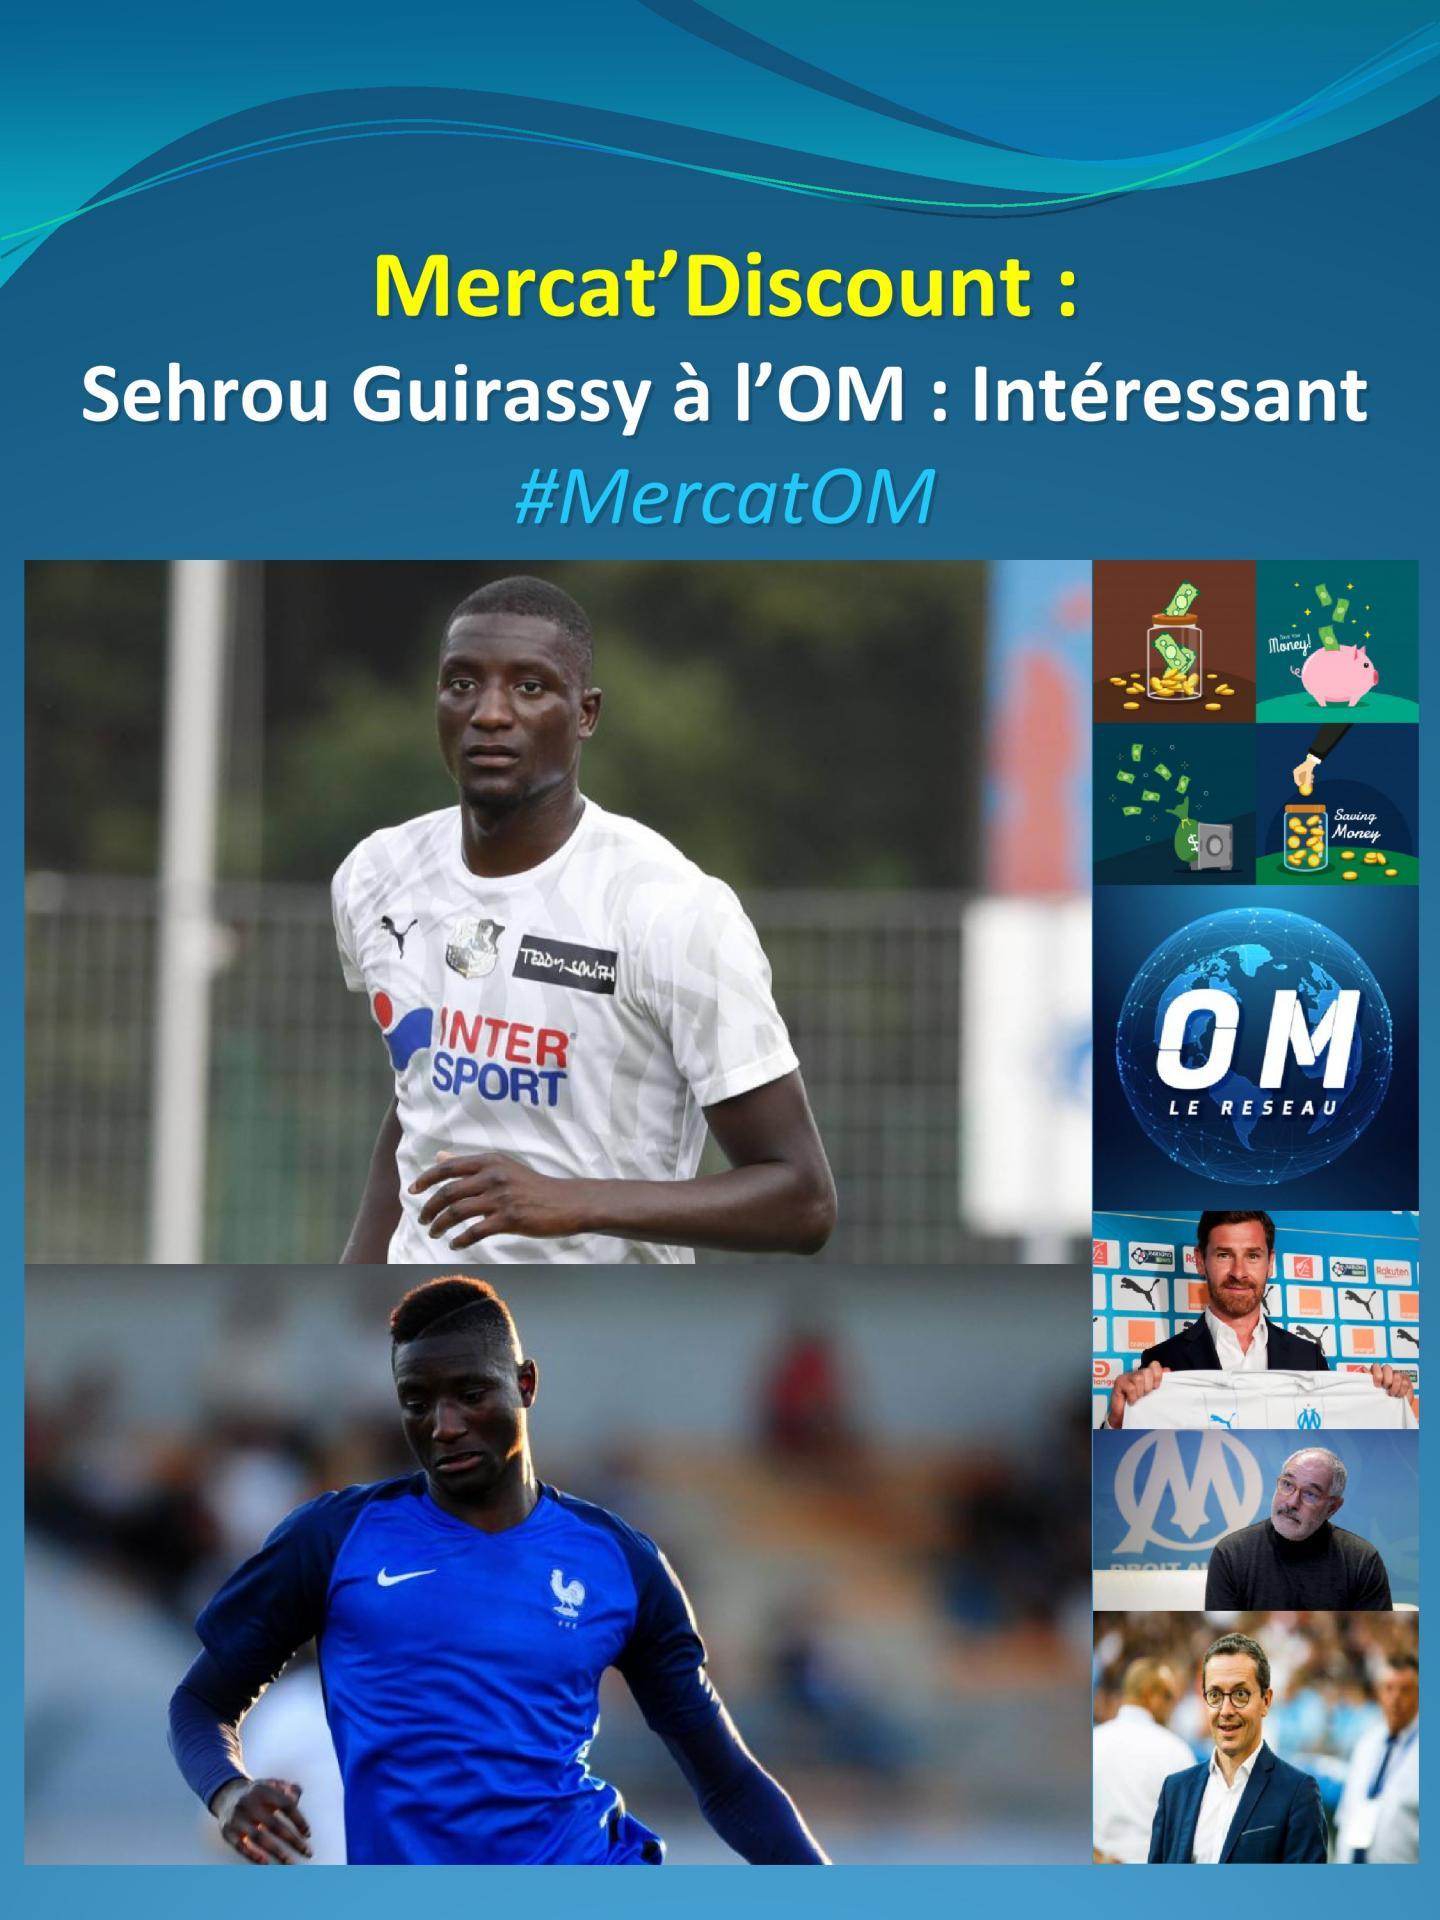 Mercat discount 3